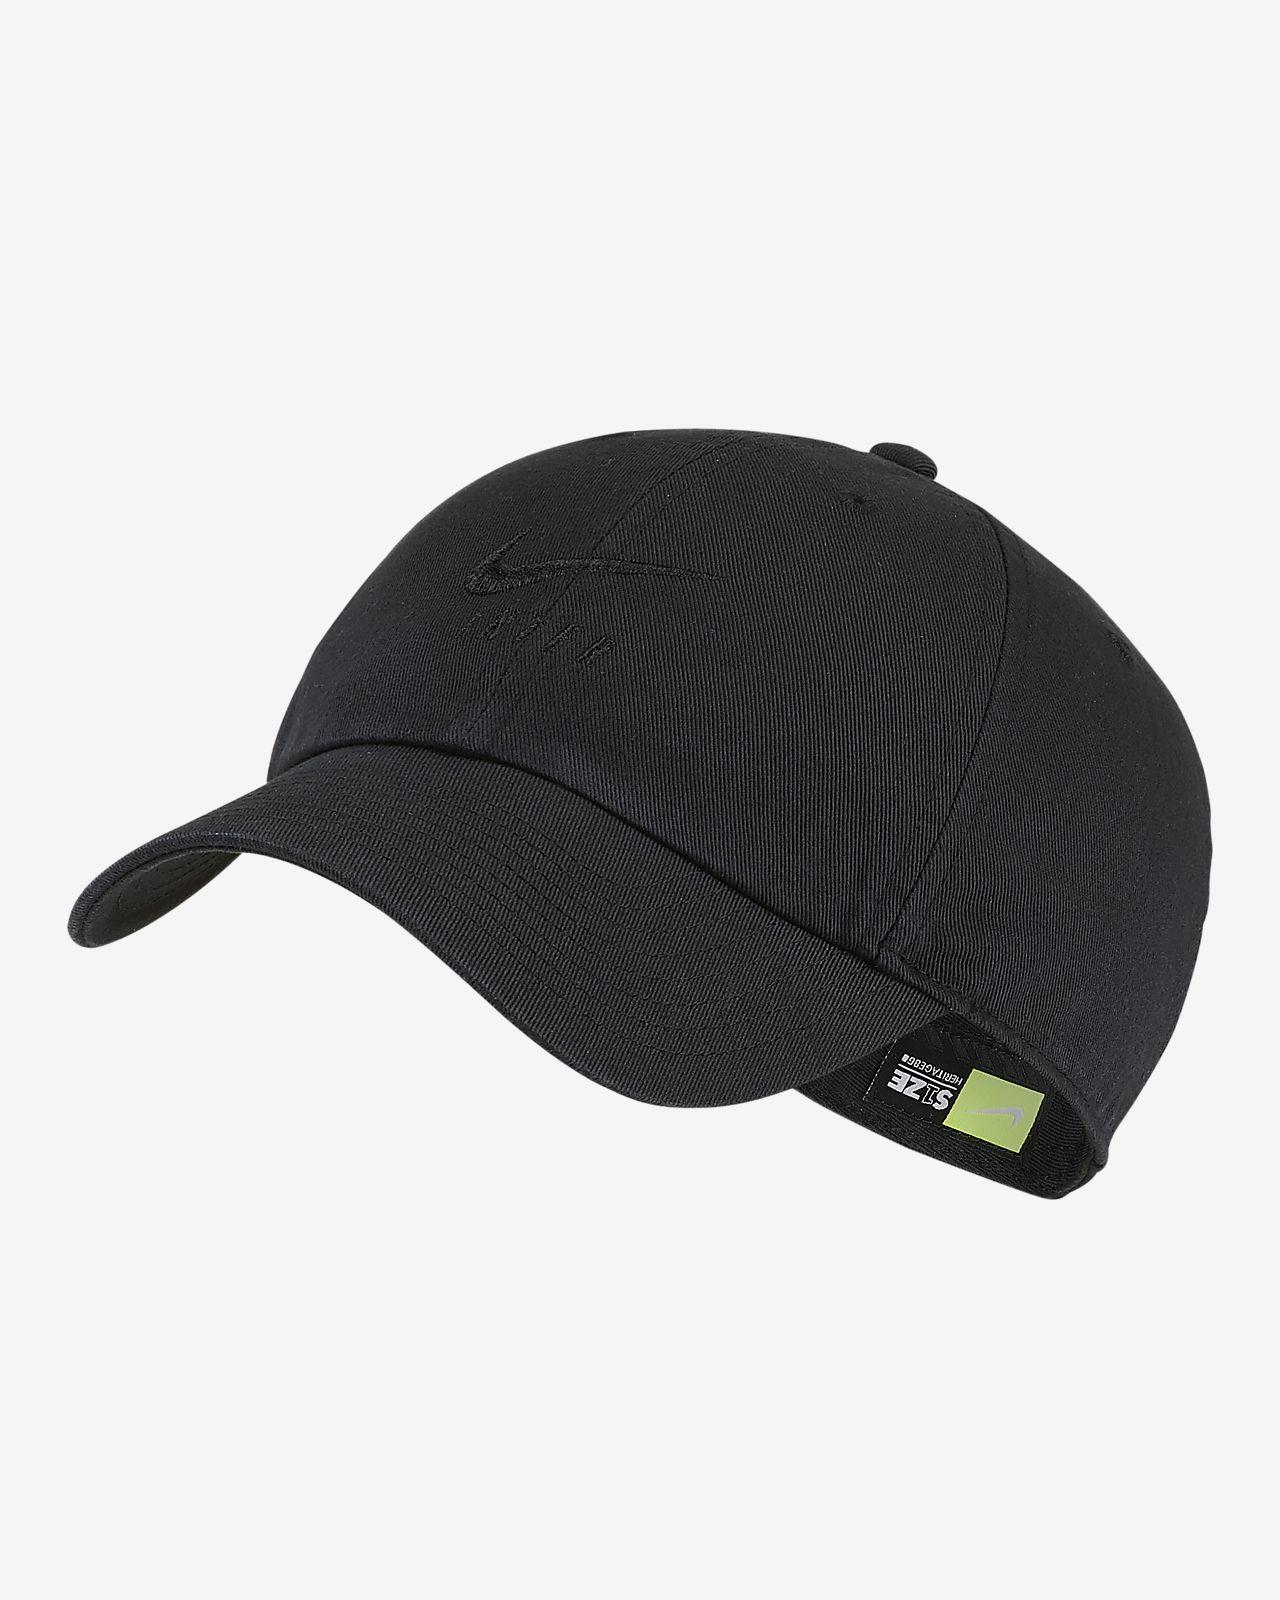 97a51724a405c Inter Milan Heritage86 Adjustable Hat. Nike.com AU